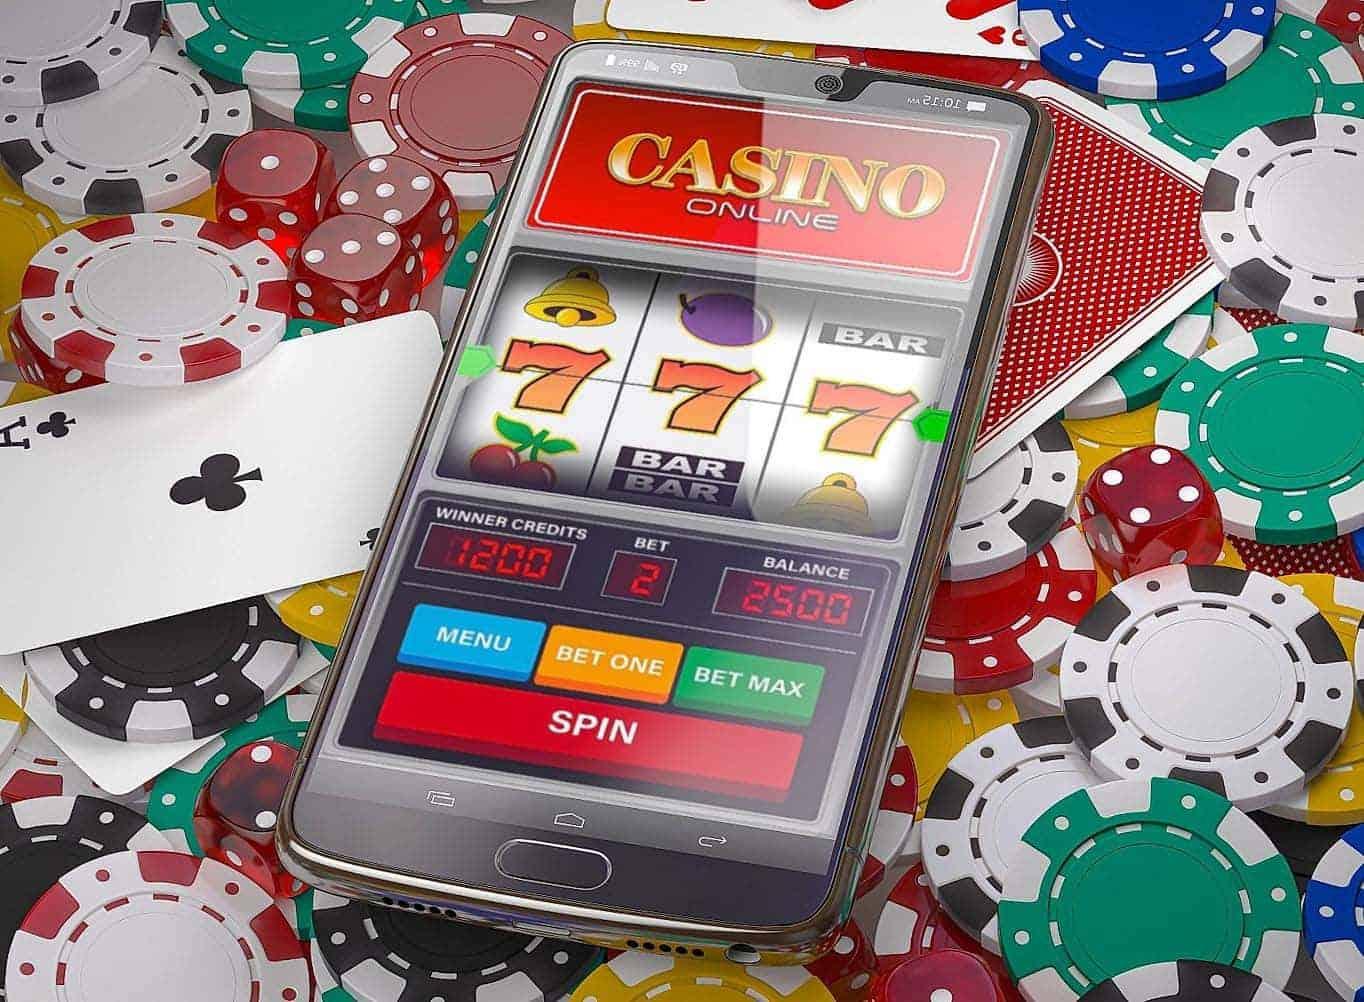 Slots on smartphone: comfortable way to win